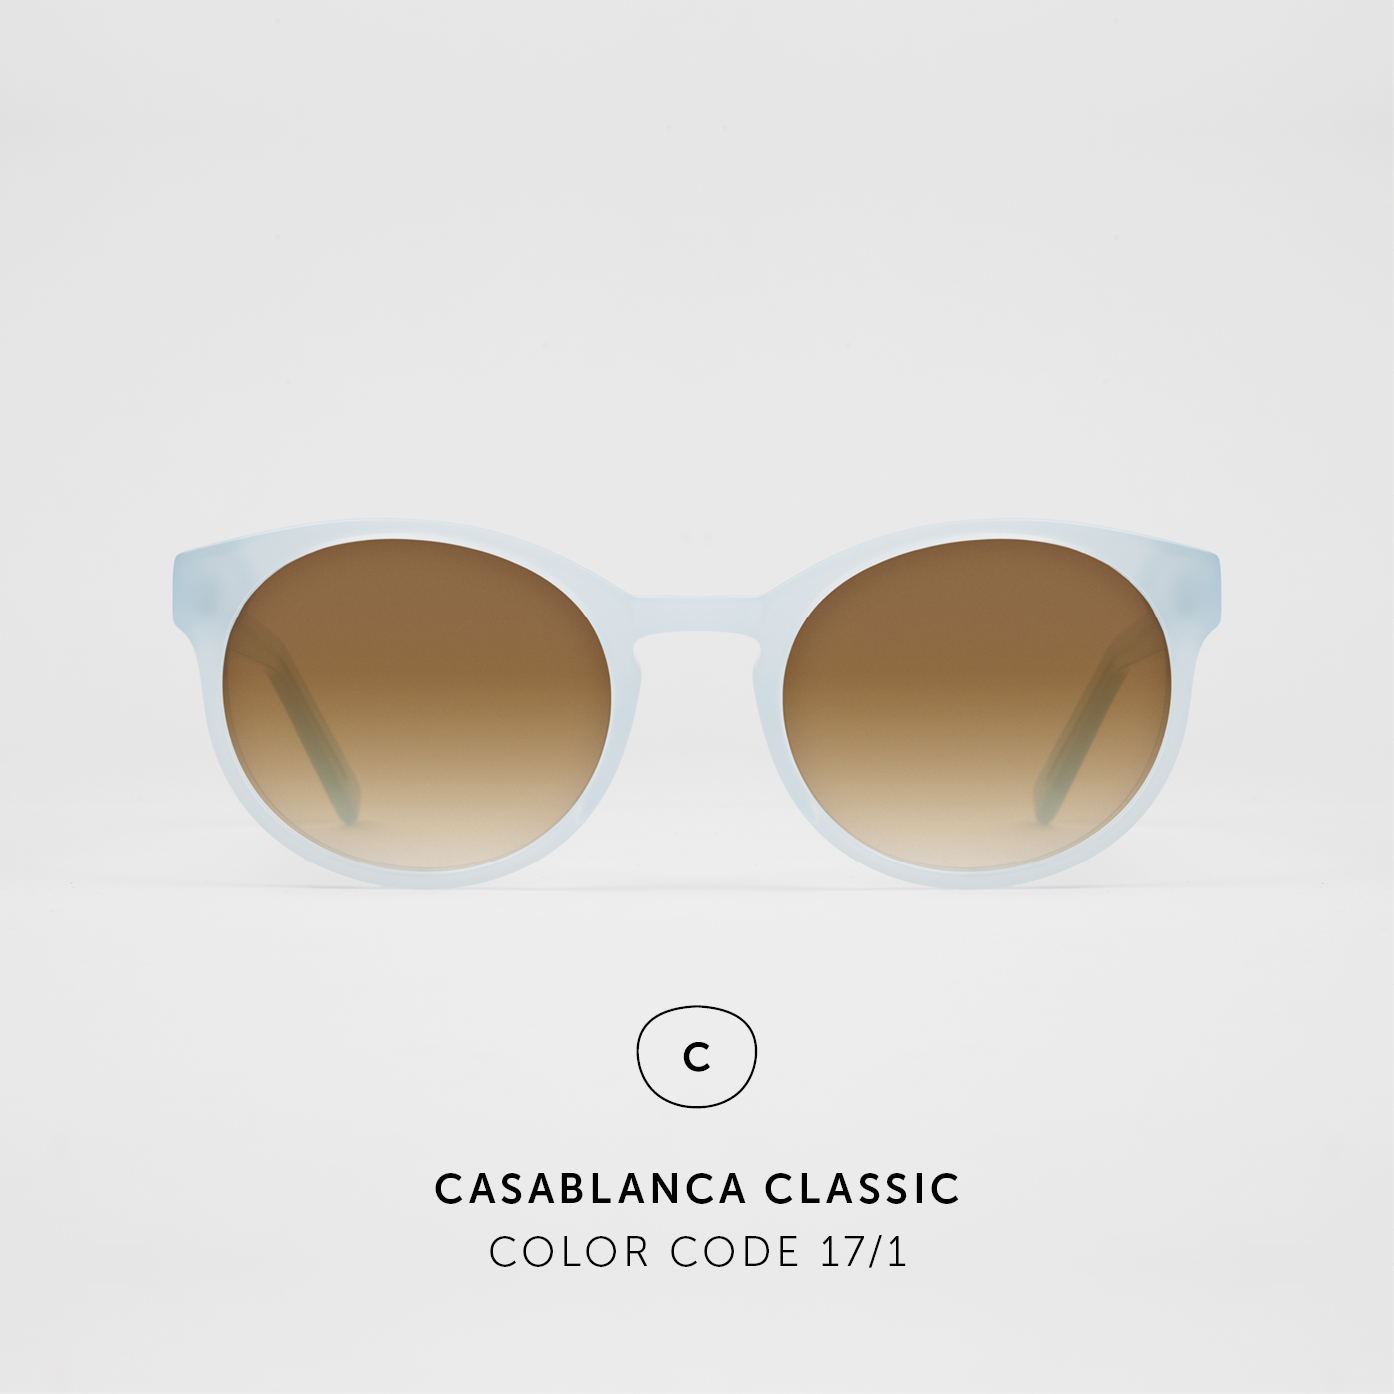 CasablancaClassic51.jpg